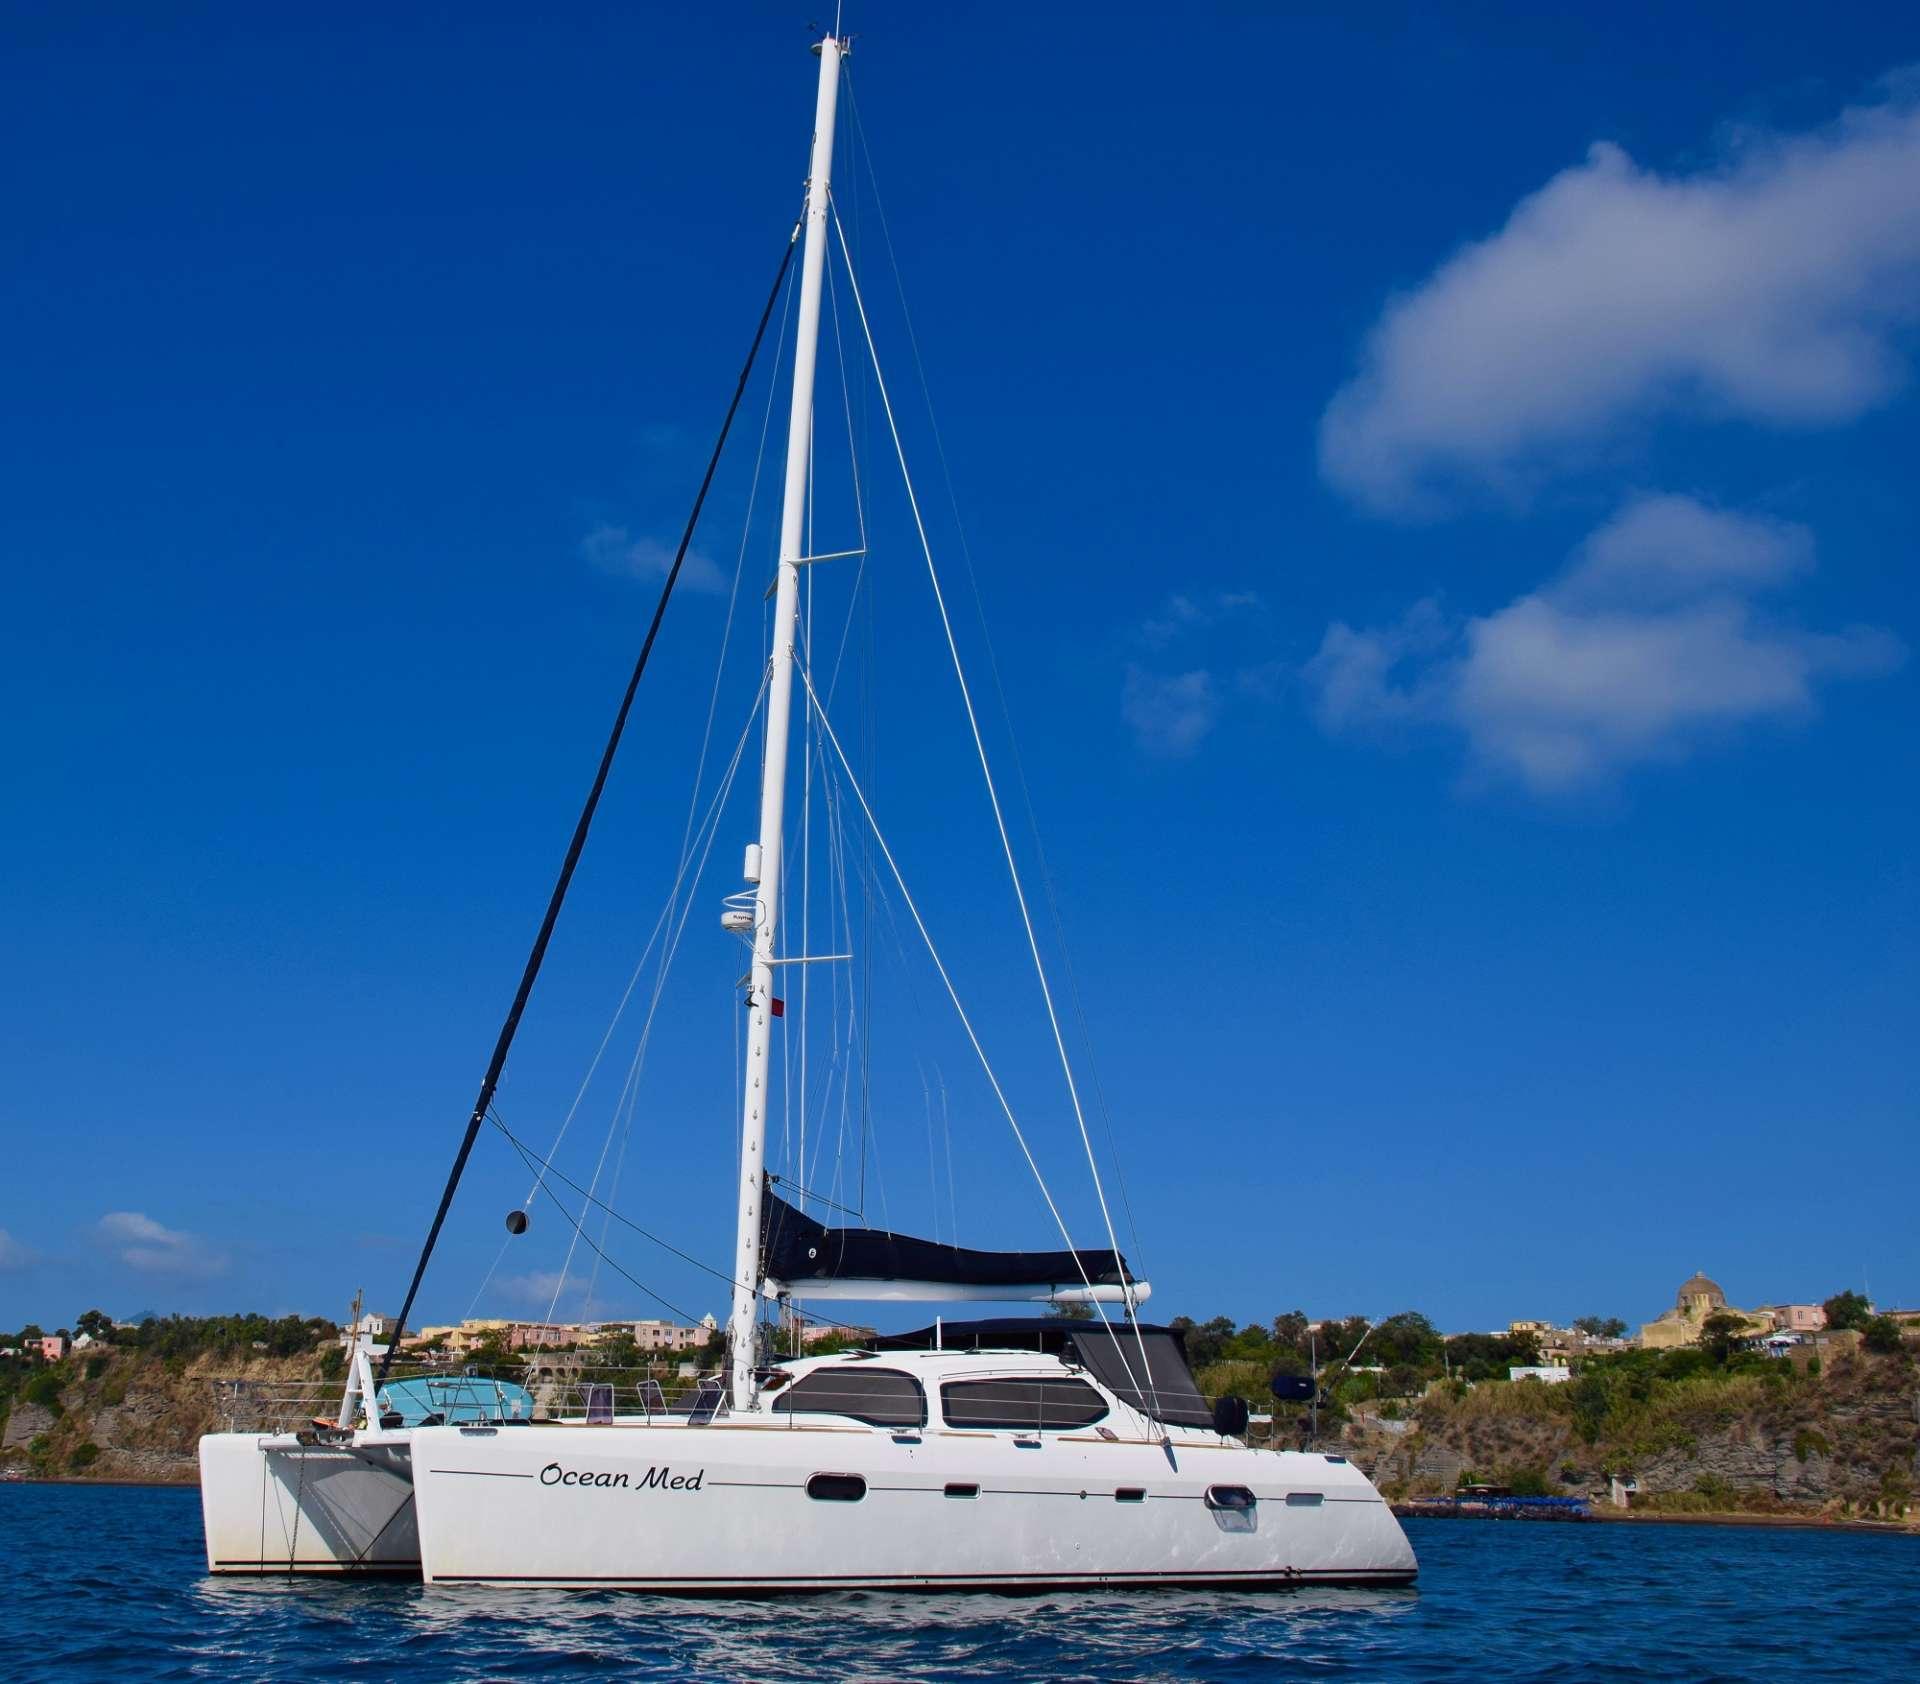 Mediterranean Catamaran Yachts Amp Boats